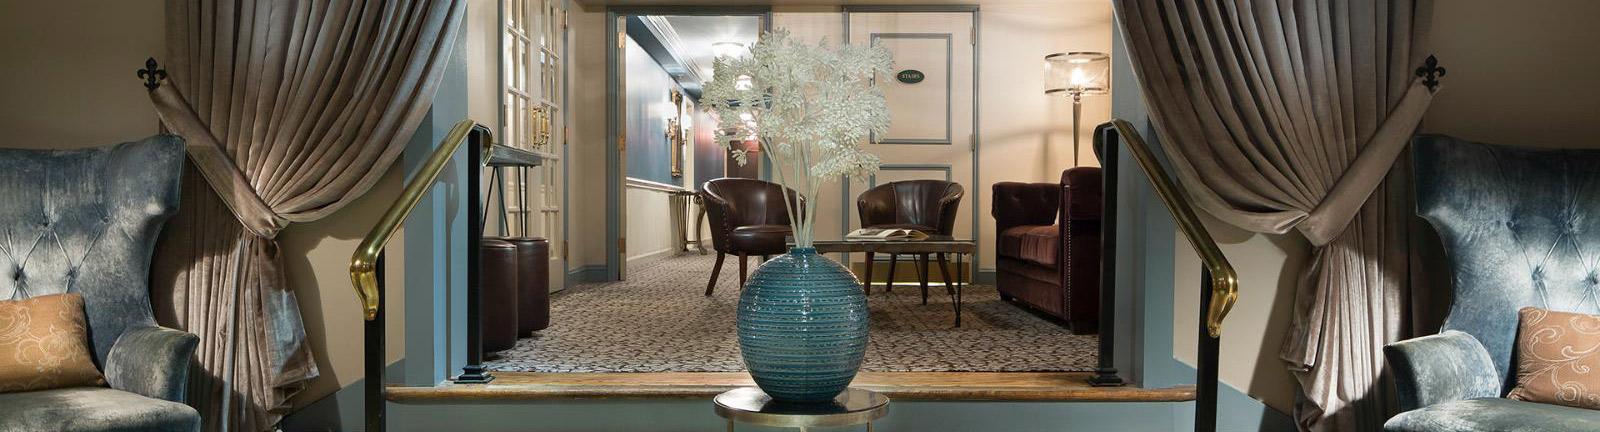 low price hotels in washington dc